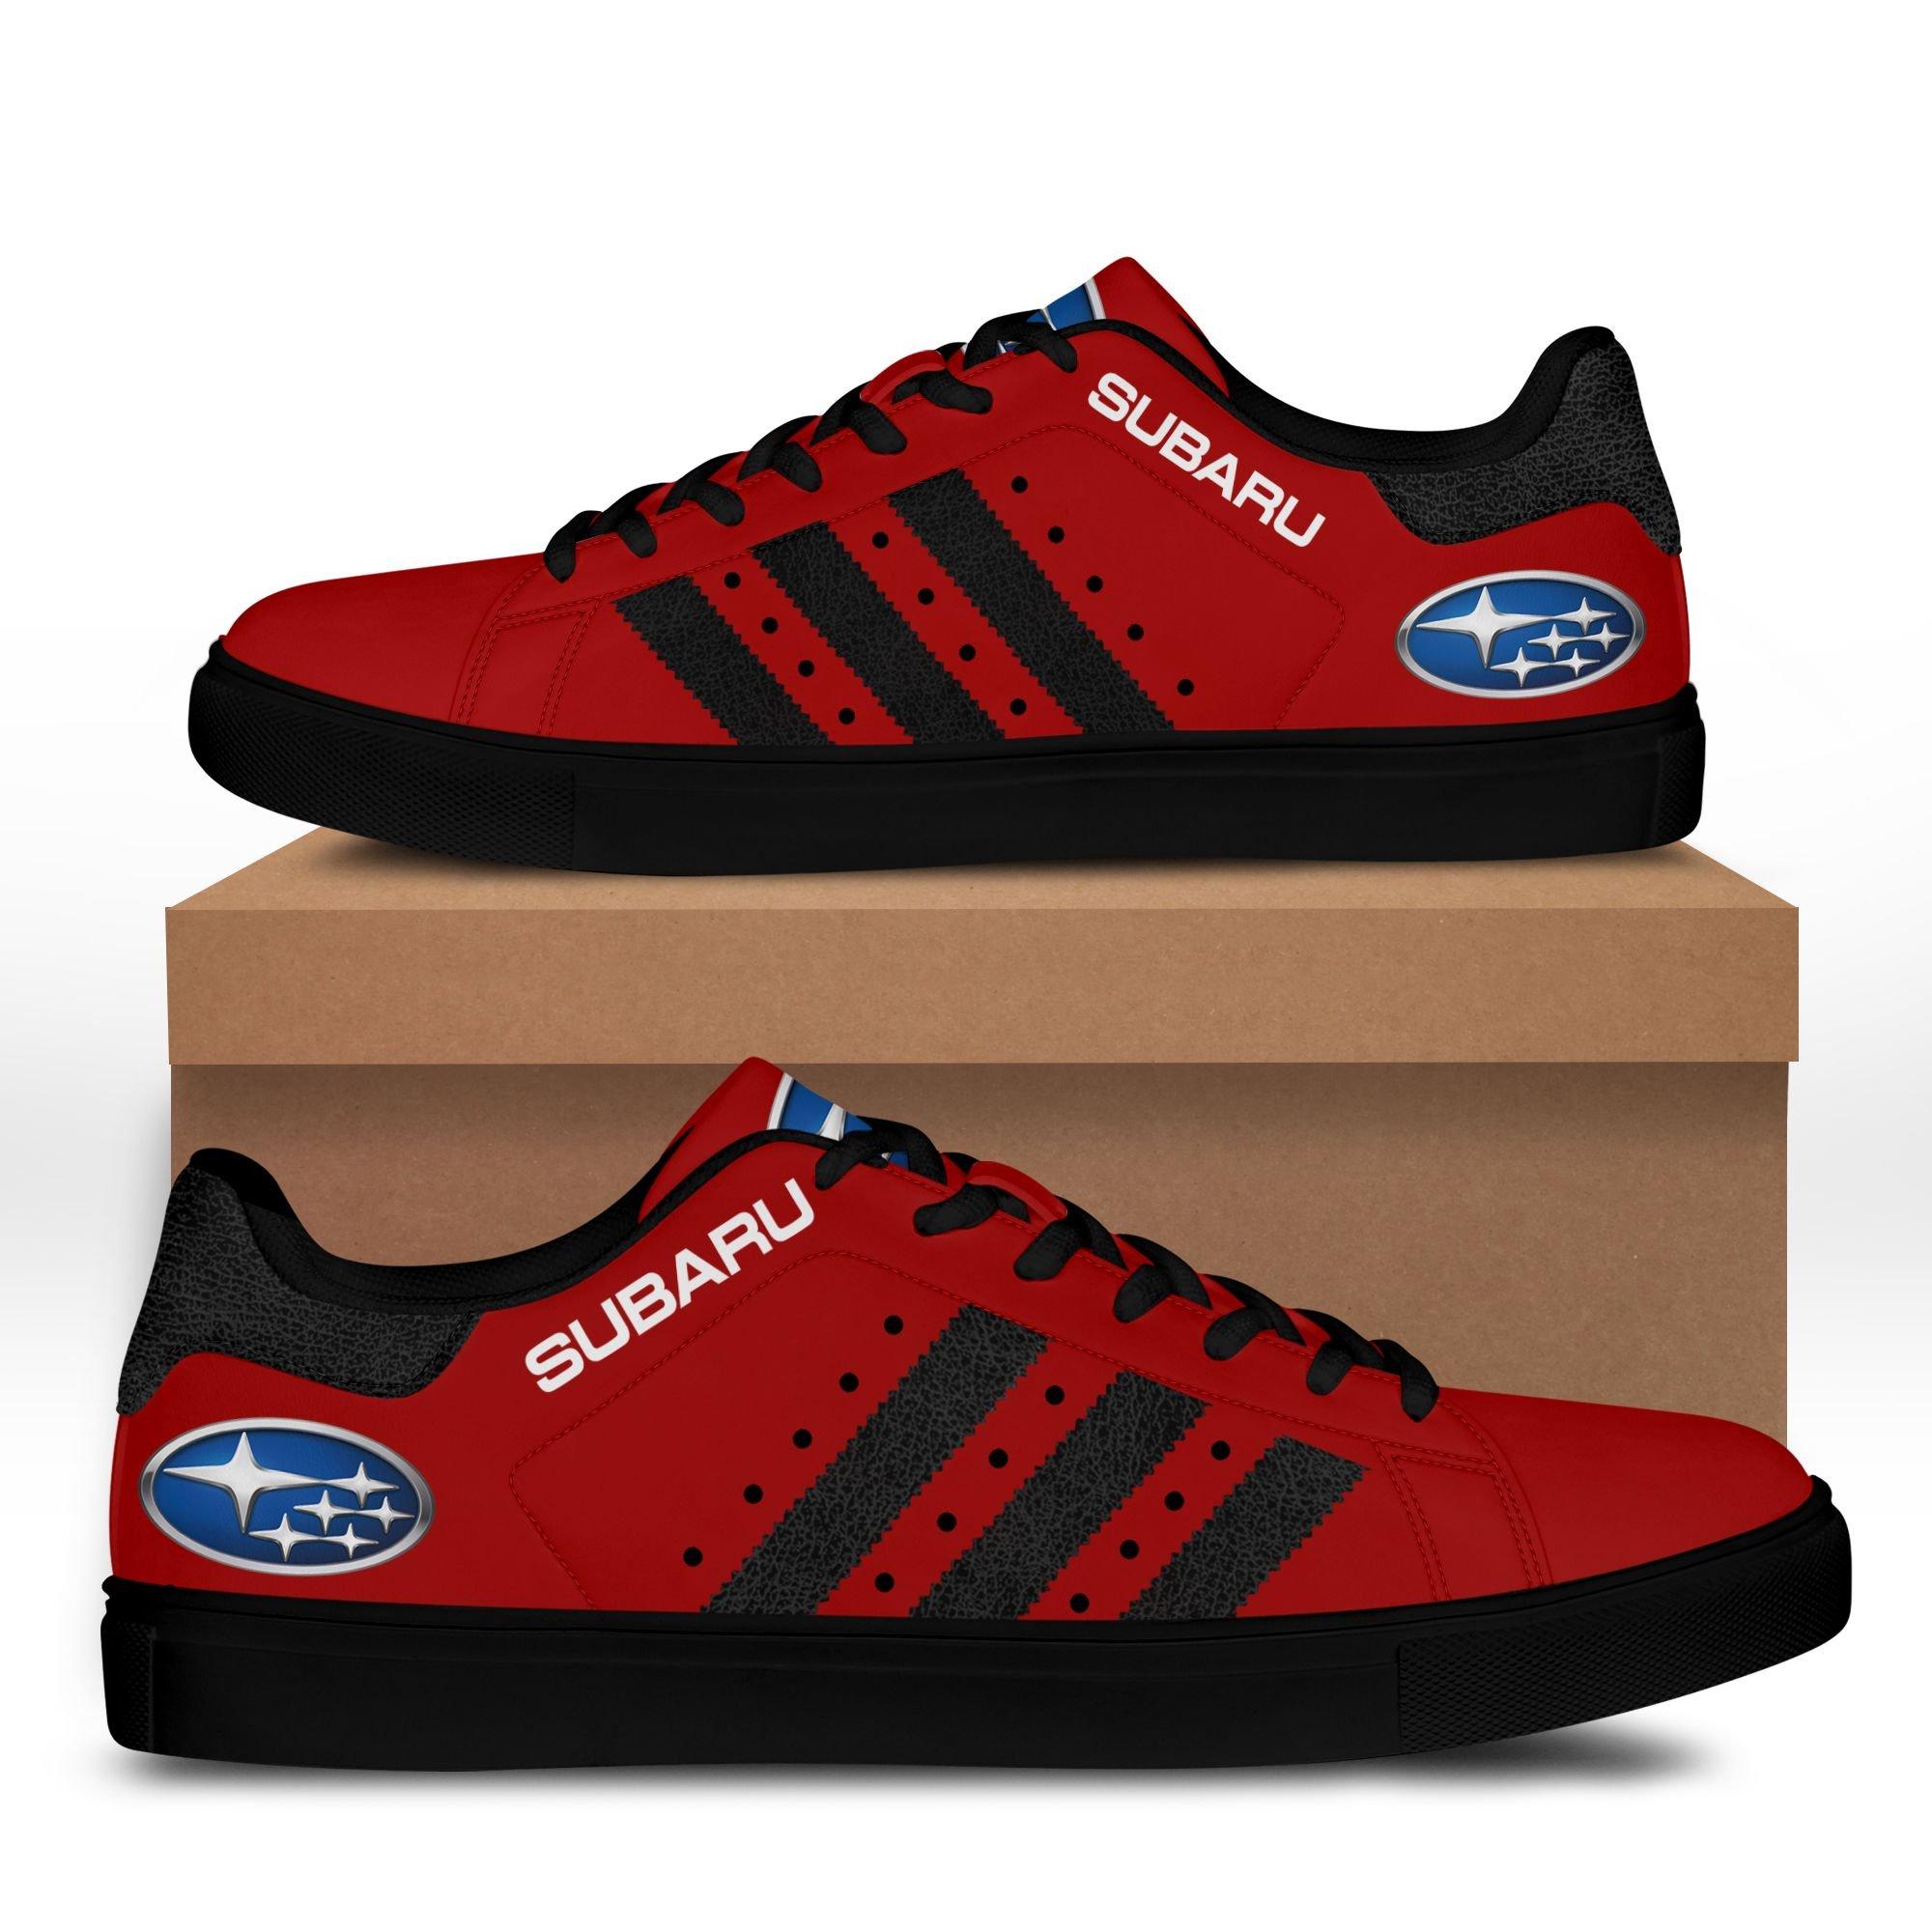 Subaru Dark Red Stan Smith Shoes